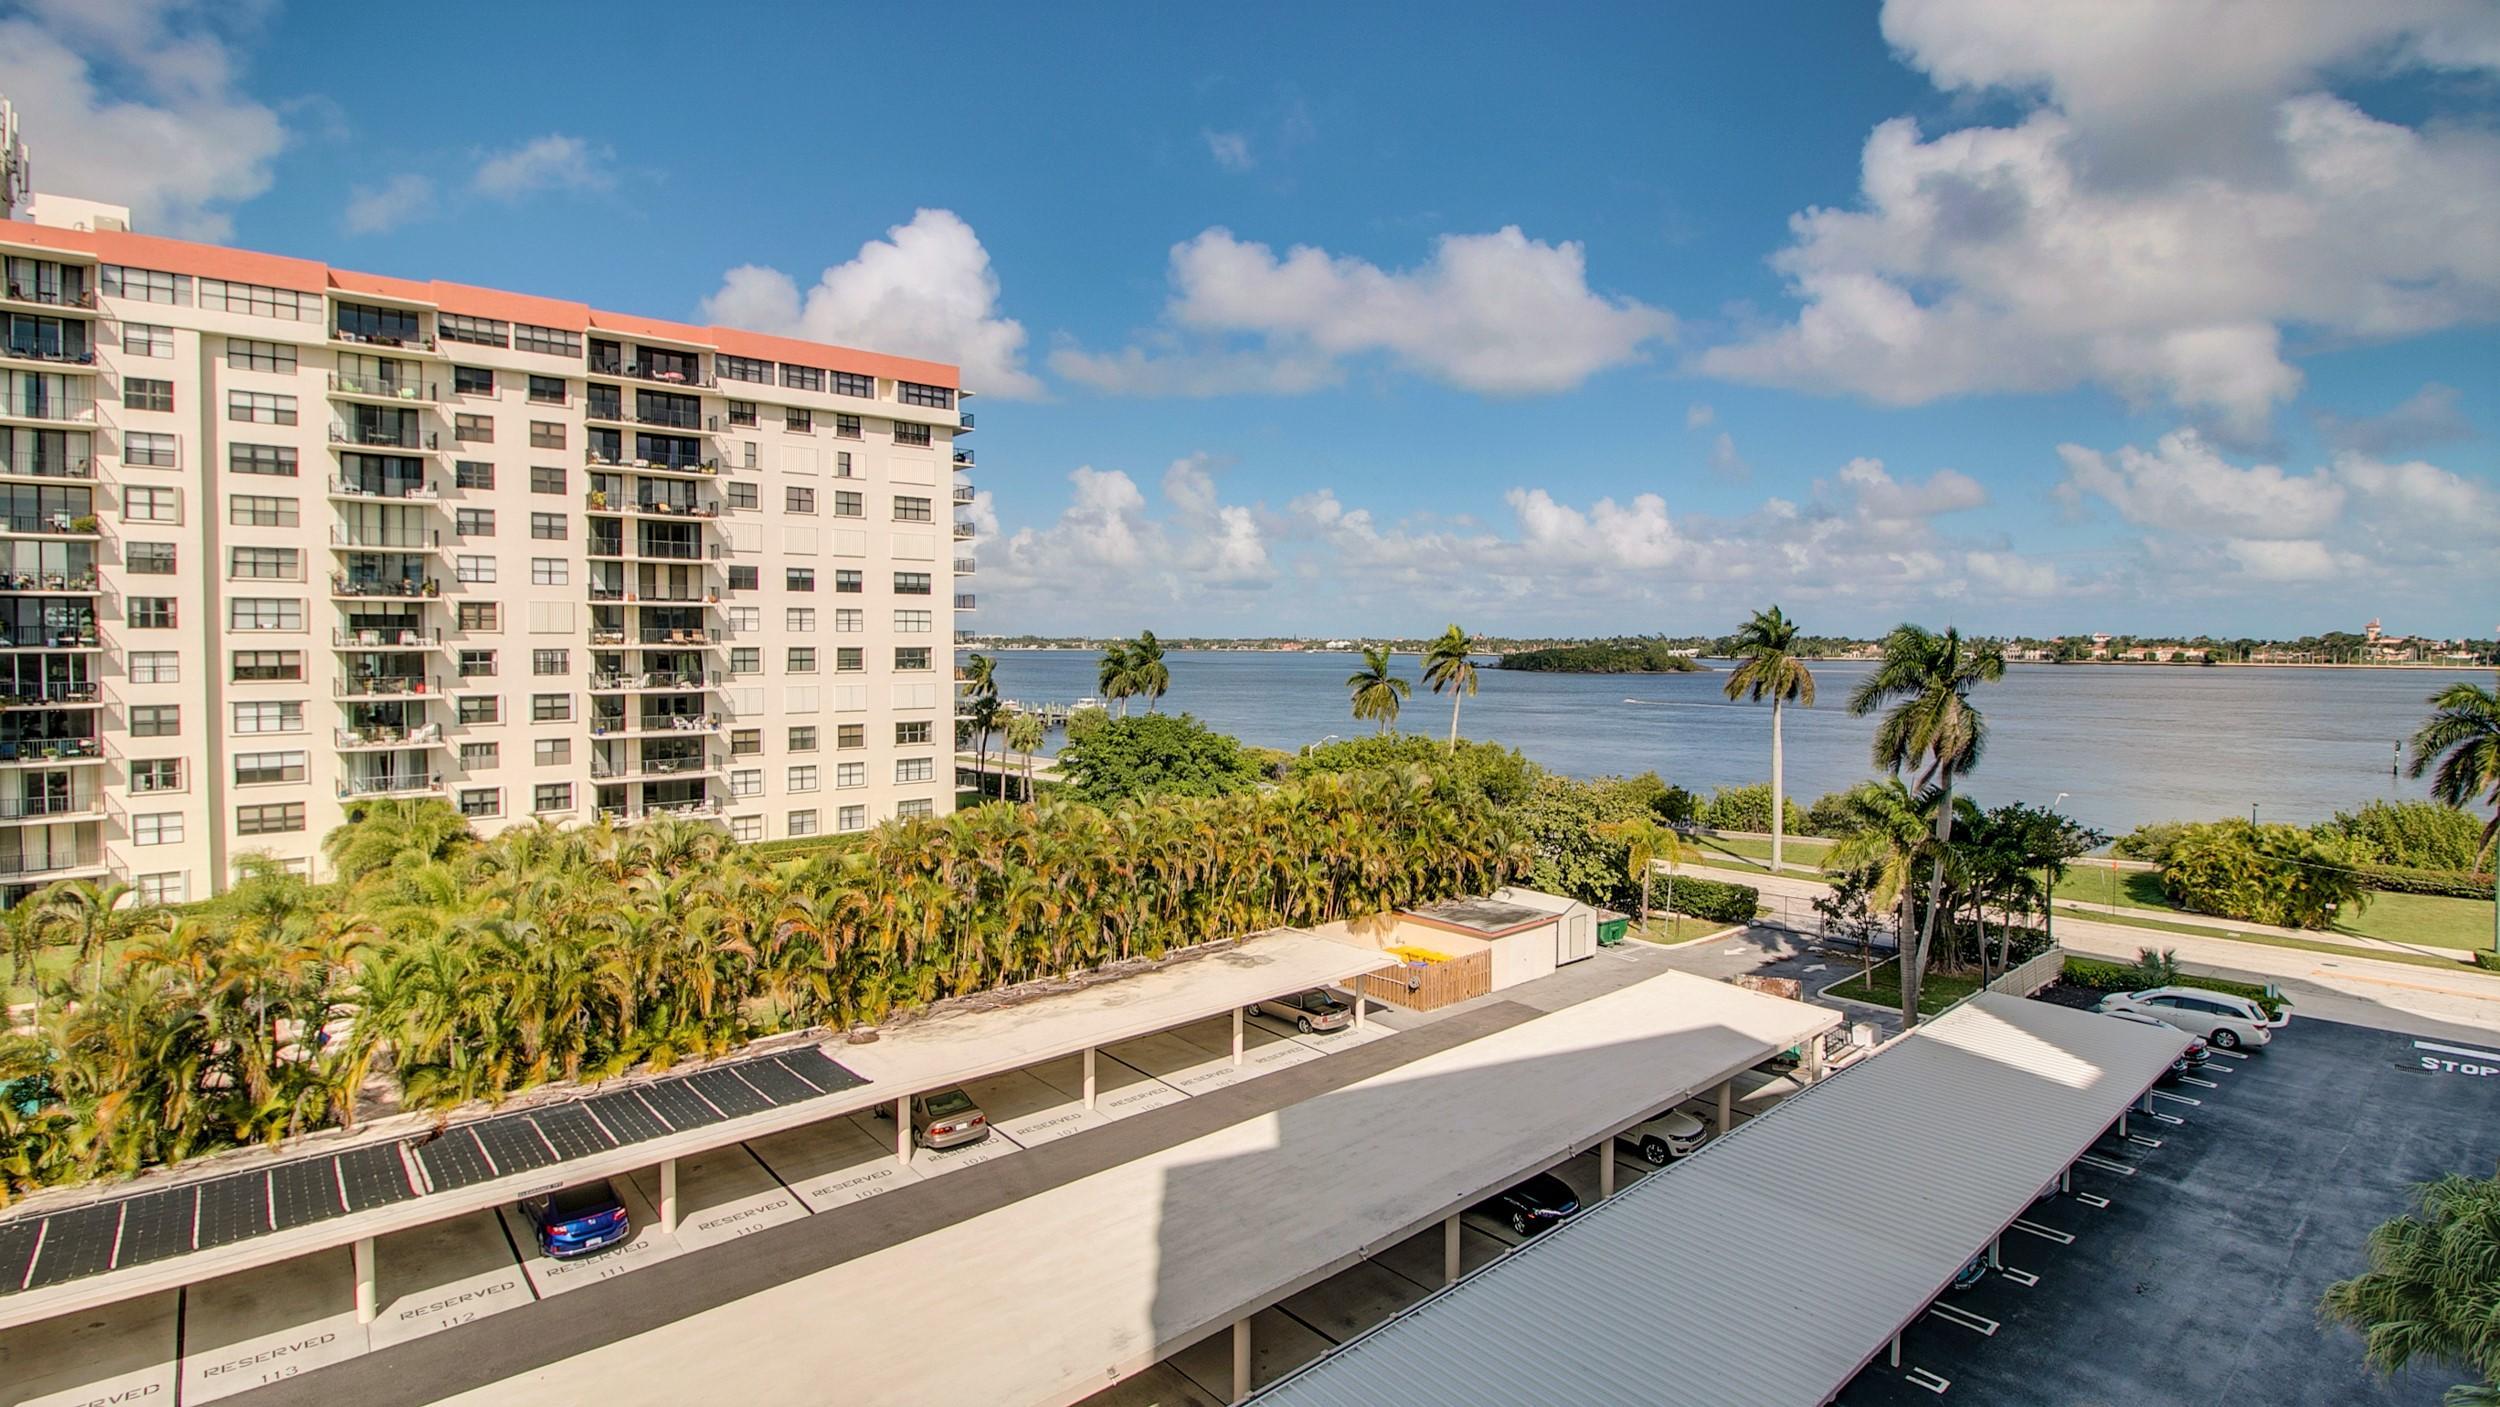 Photo of 3901 S Flagler Drive #606, West Palm Beach, FL 33405